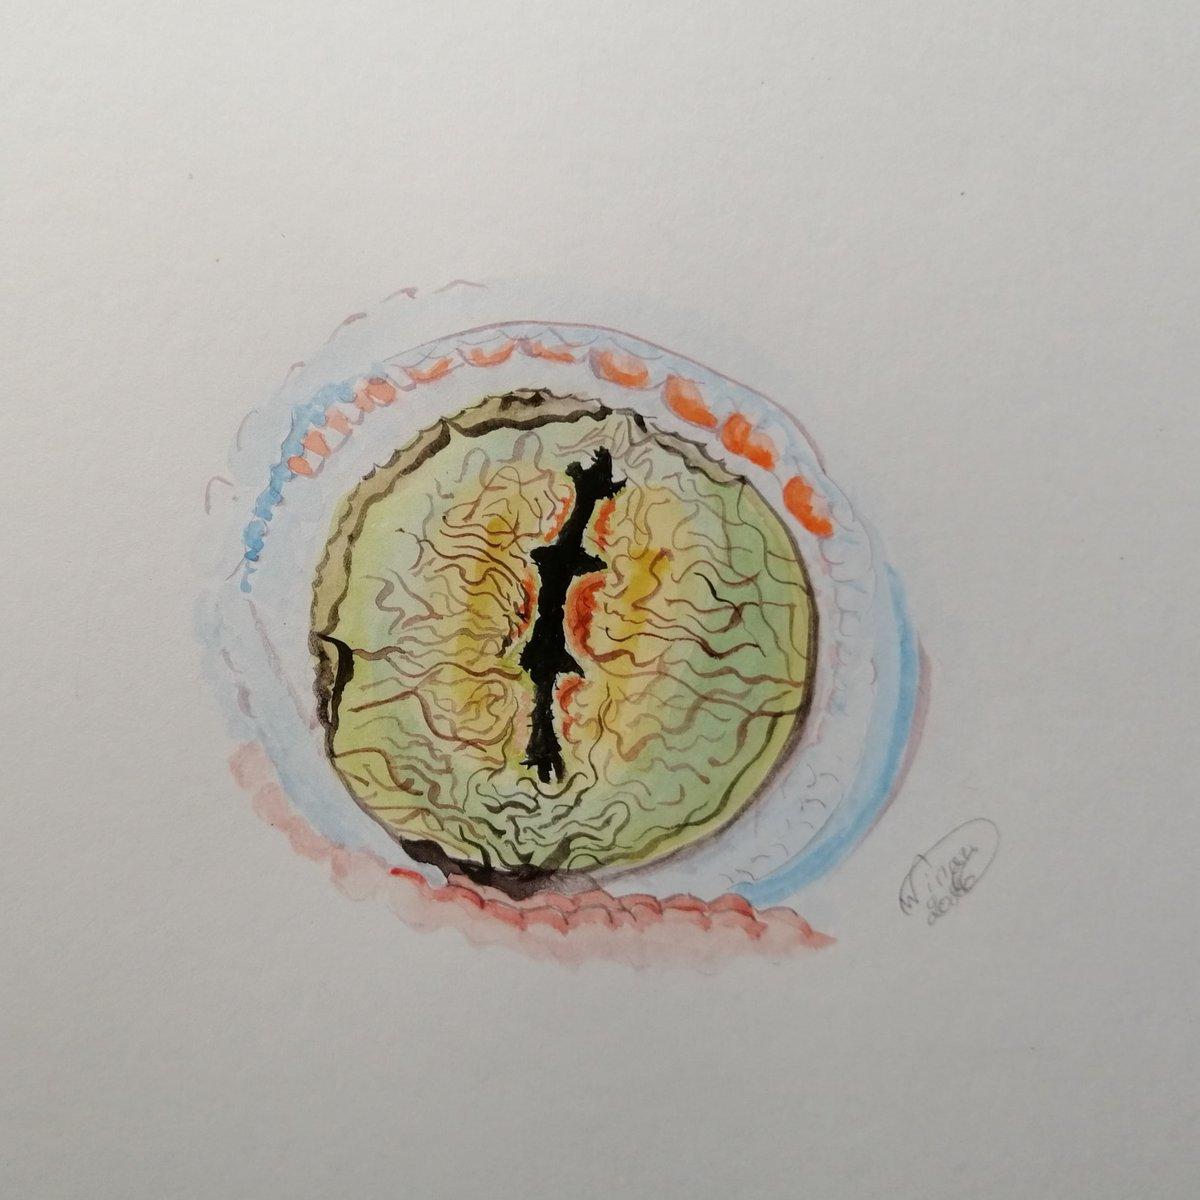 Gecko Eye   #inktober #inktober52 #inktober52eyespic.twitter.com/4gSDxzgY4Q